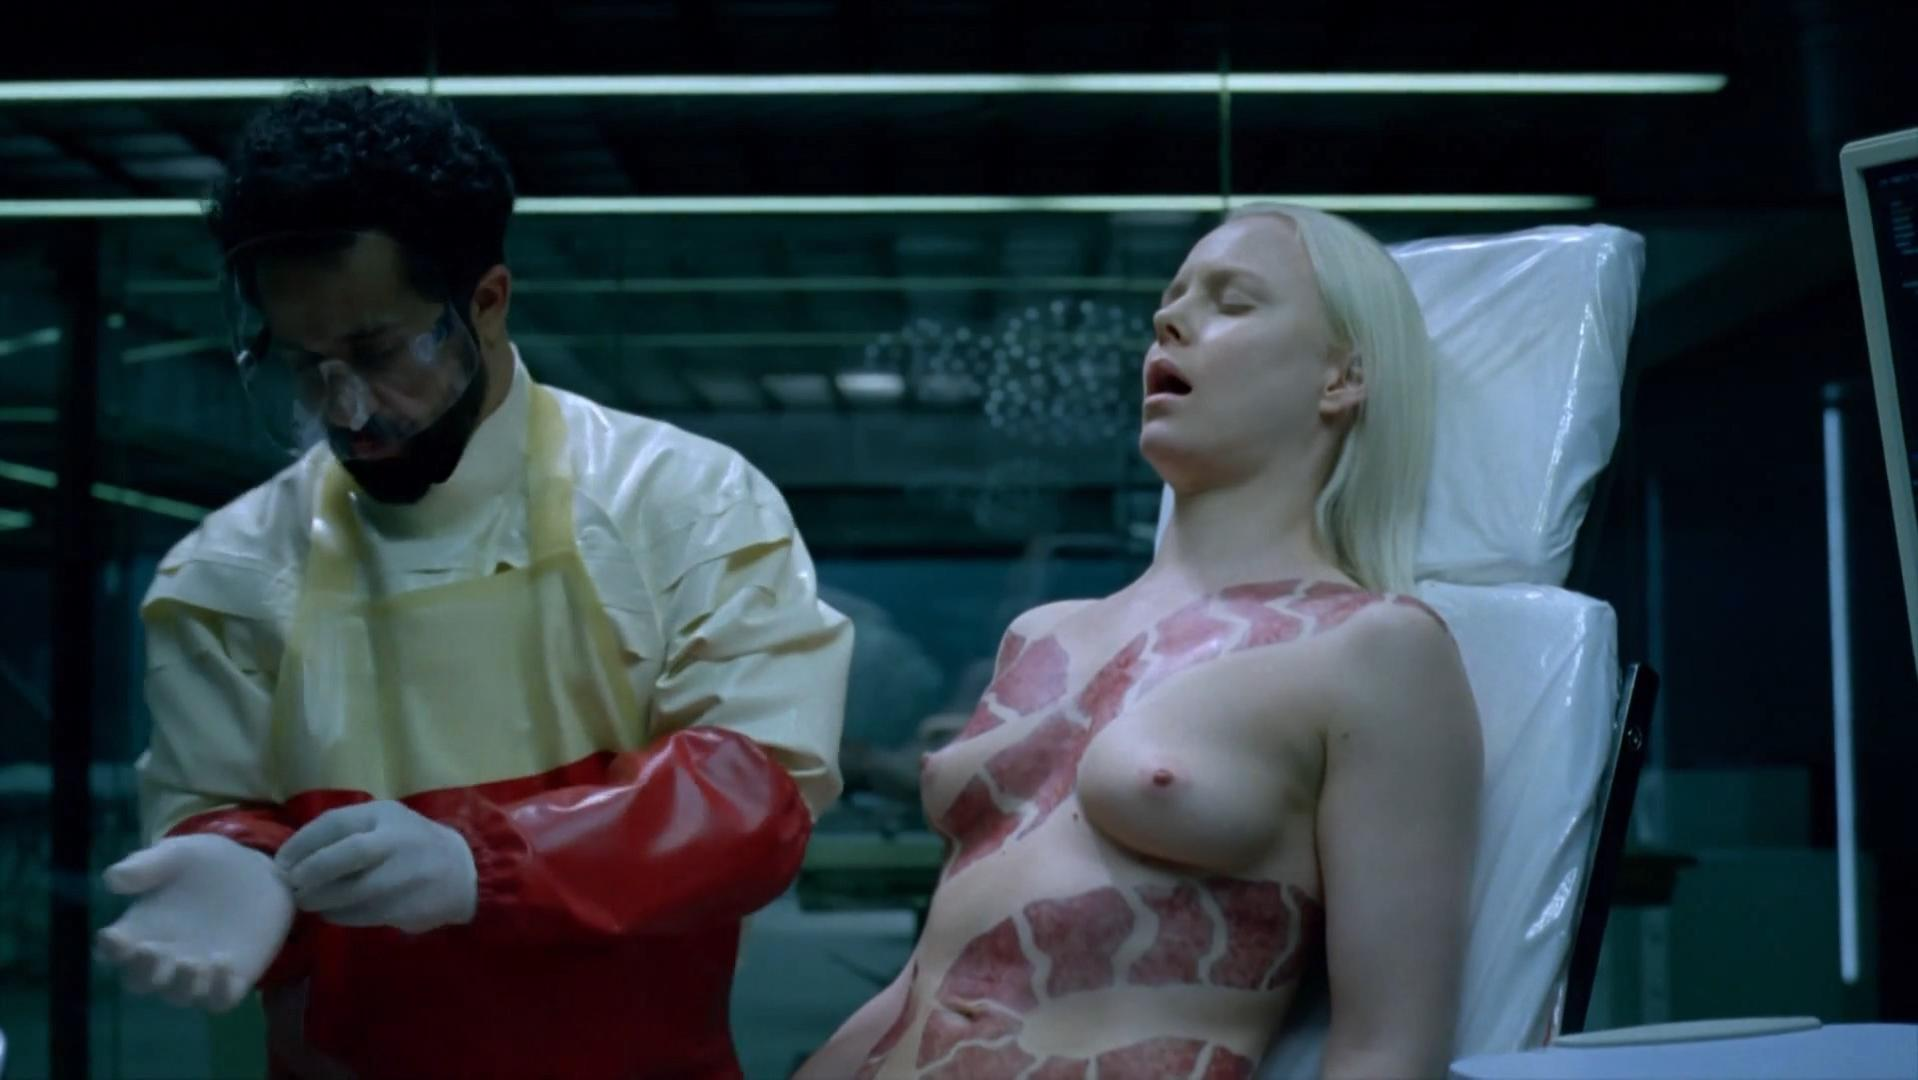 Angela Sarafyan Tits nude video celebs » ingrid bolso berdal nude - westworld